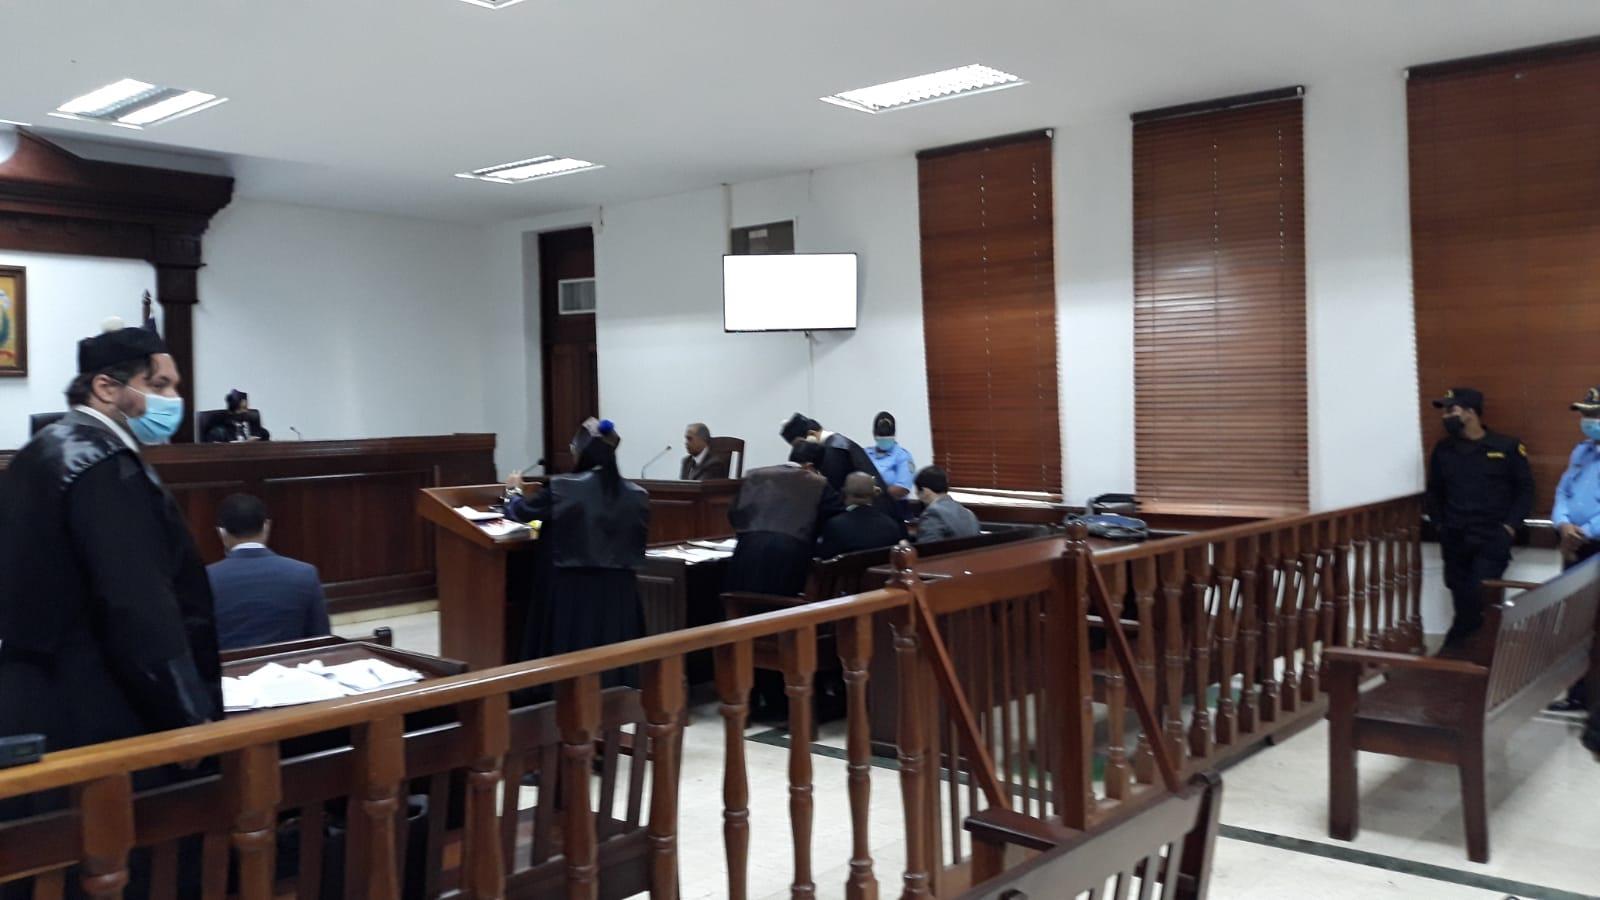 Testigo de acusado asegura Andrea Celea sufrió caída sin intervenir un tercero